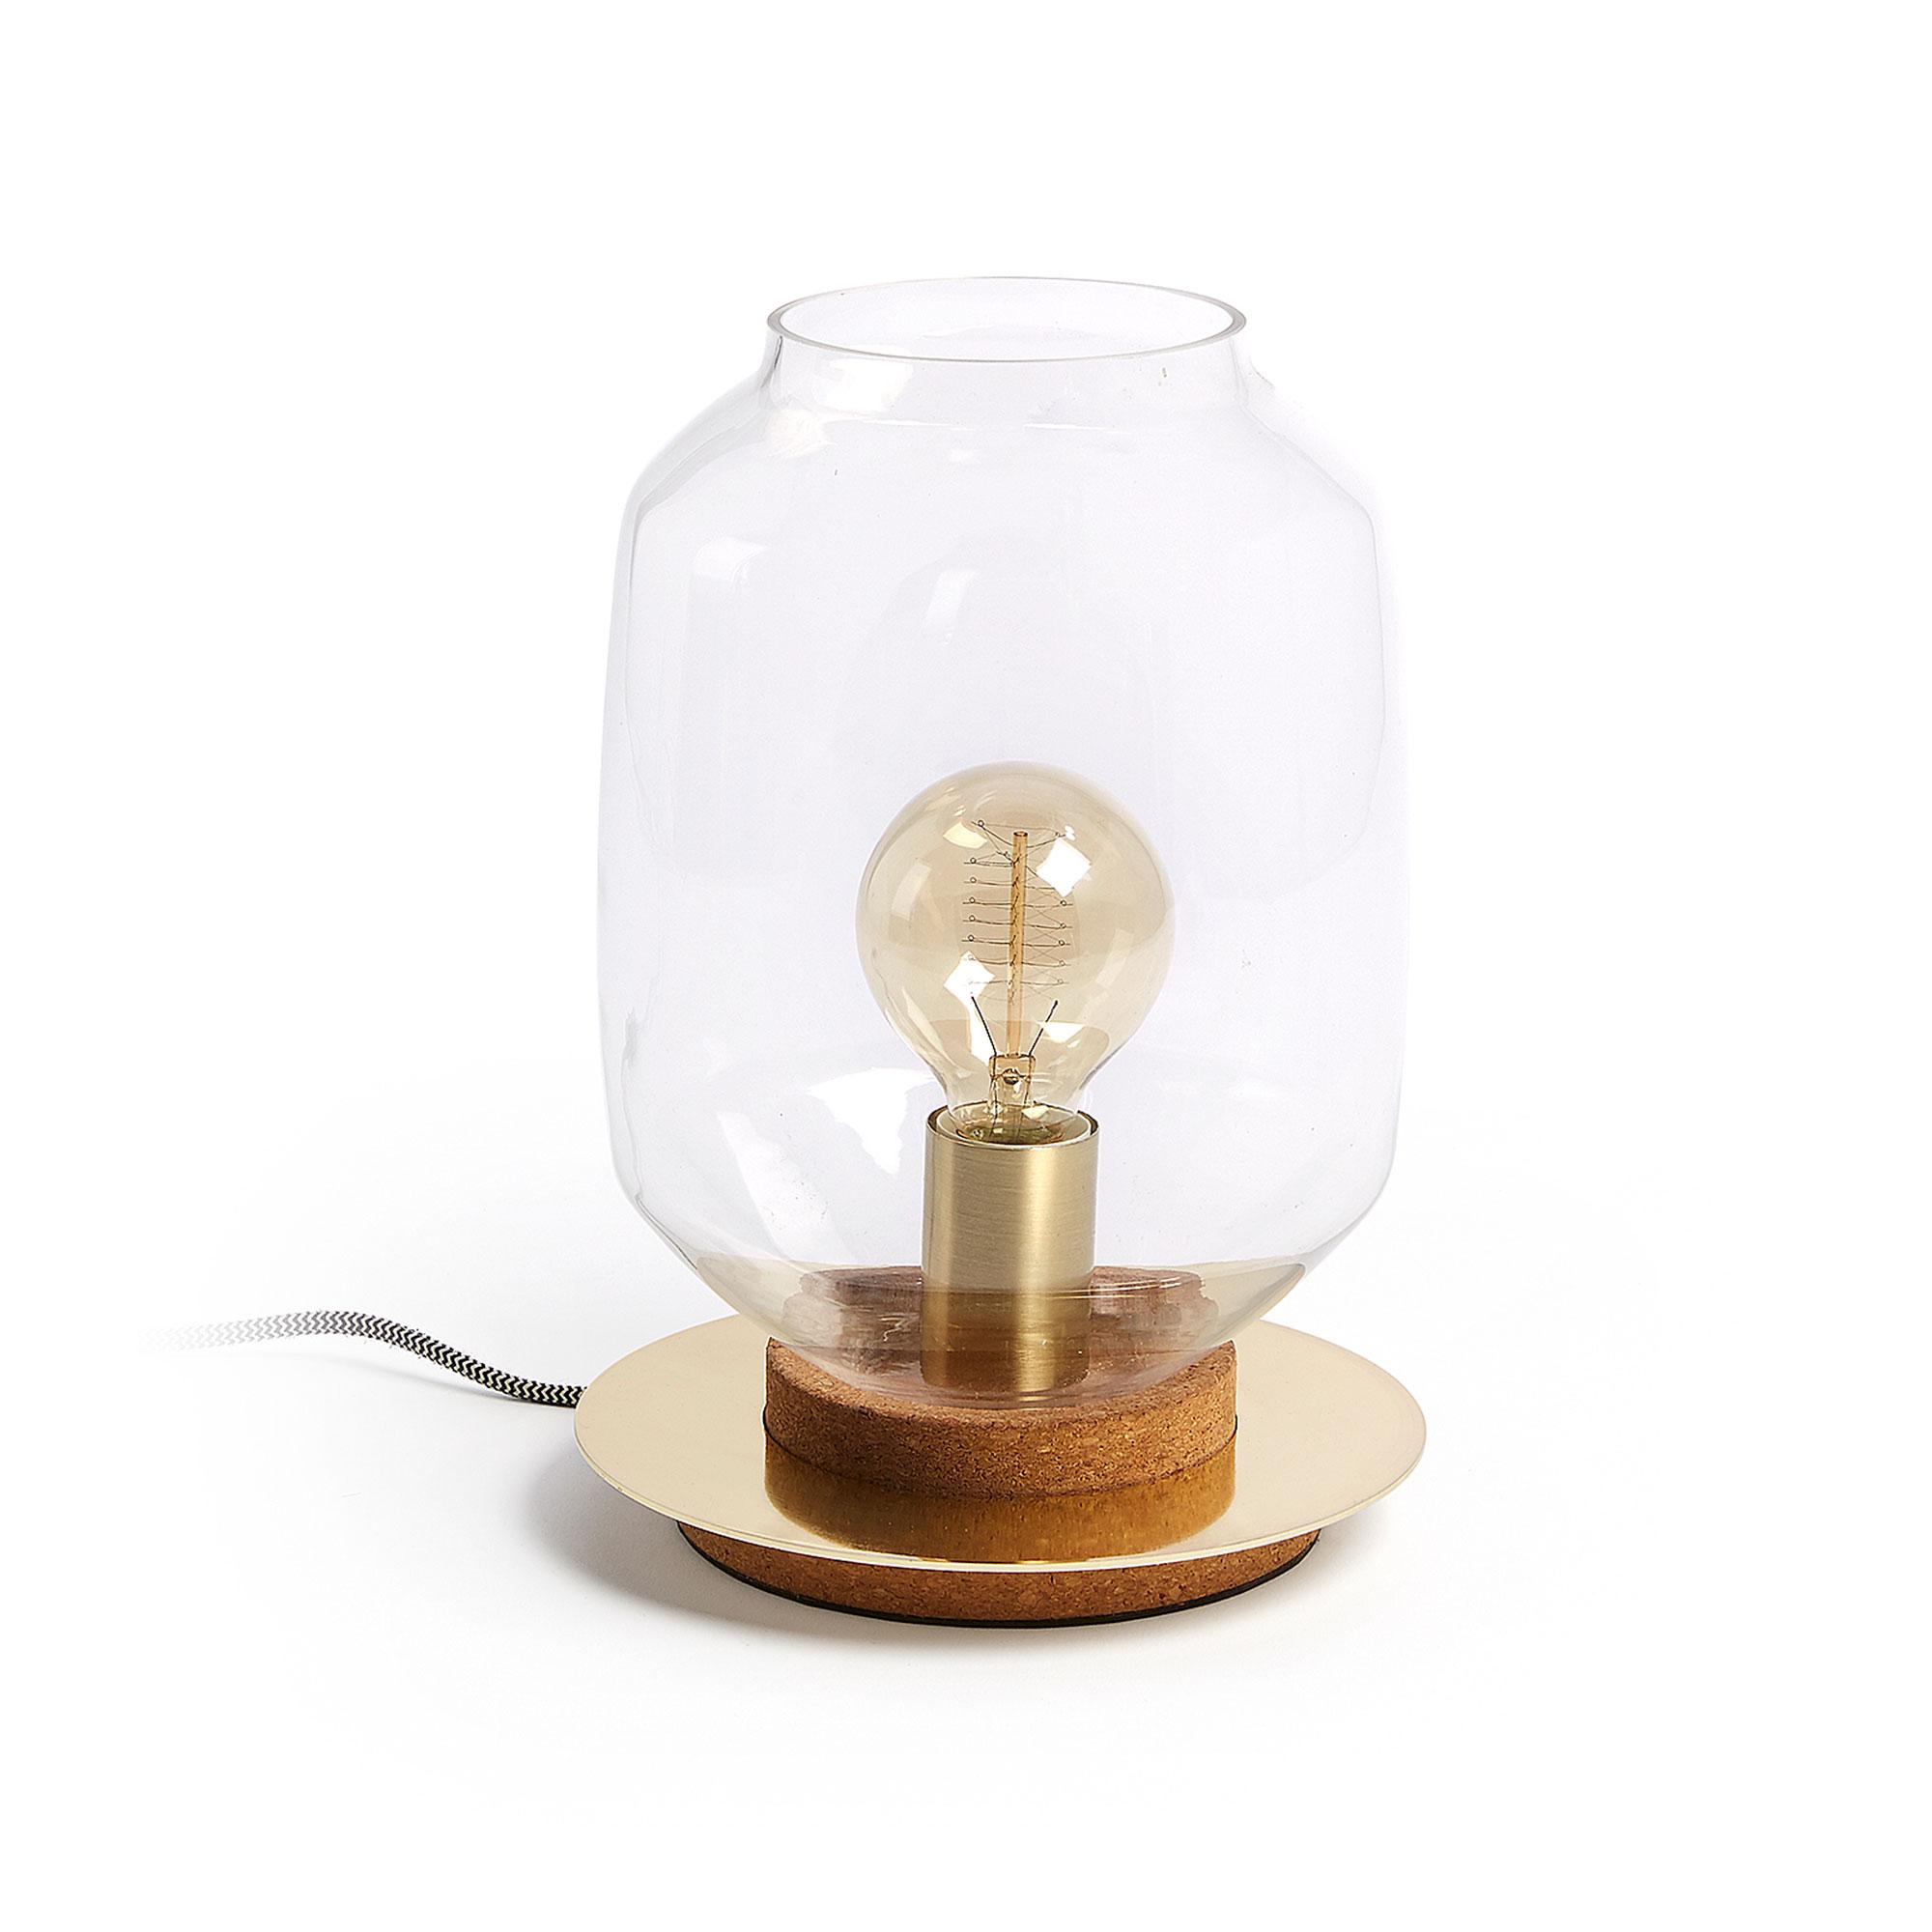 Laforma mery bordlampe - messing/klar metal/glas, rund (ø19) fra laforma fra boboonline.dk